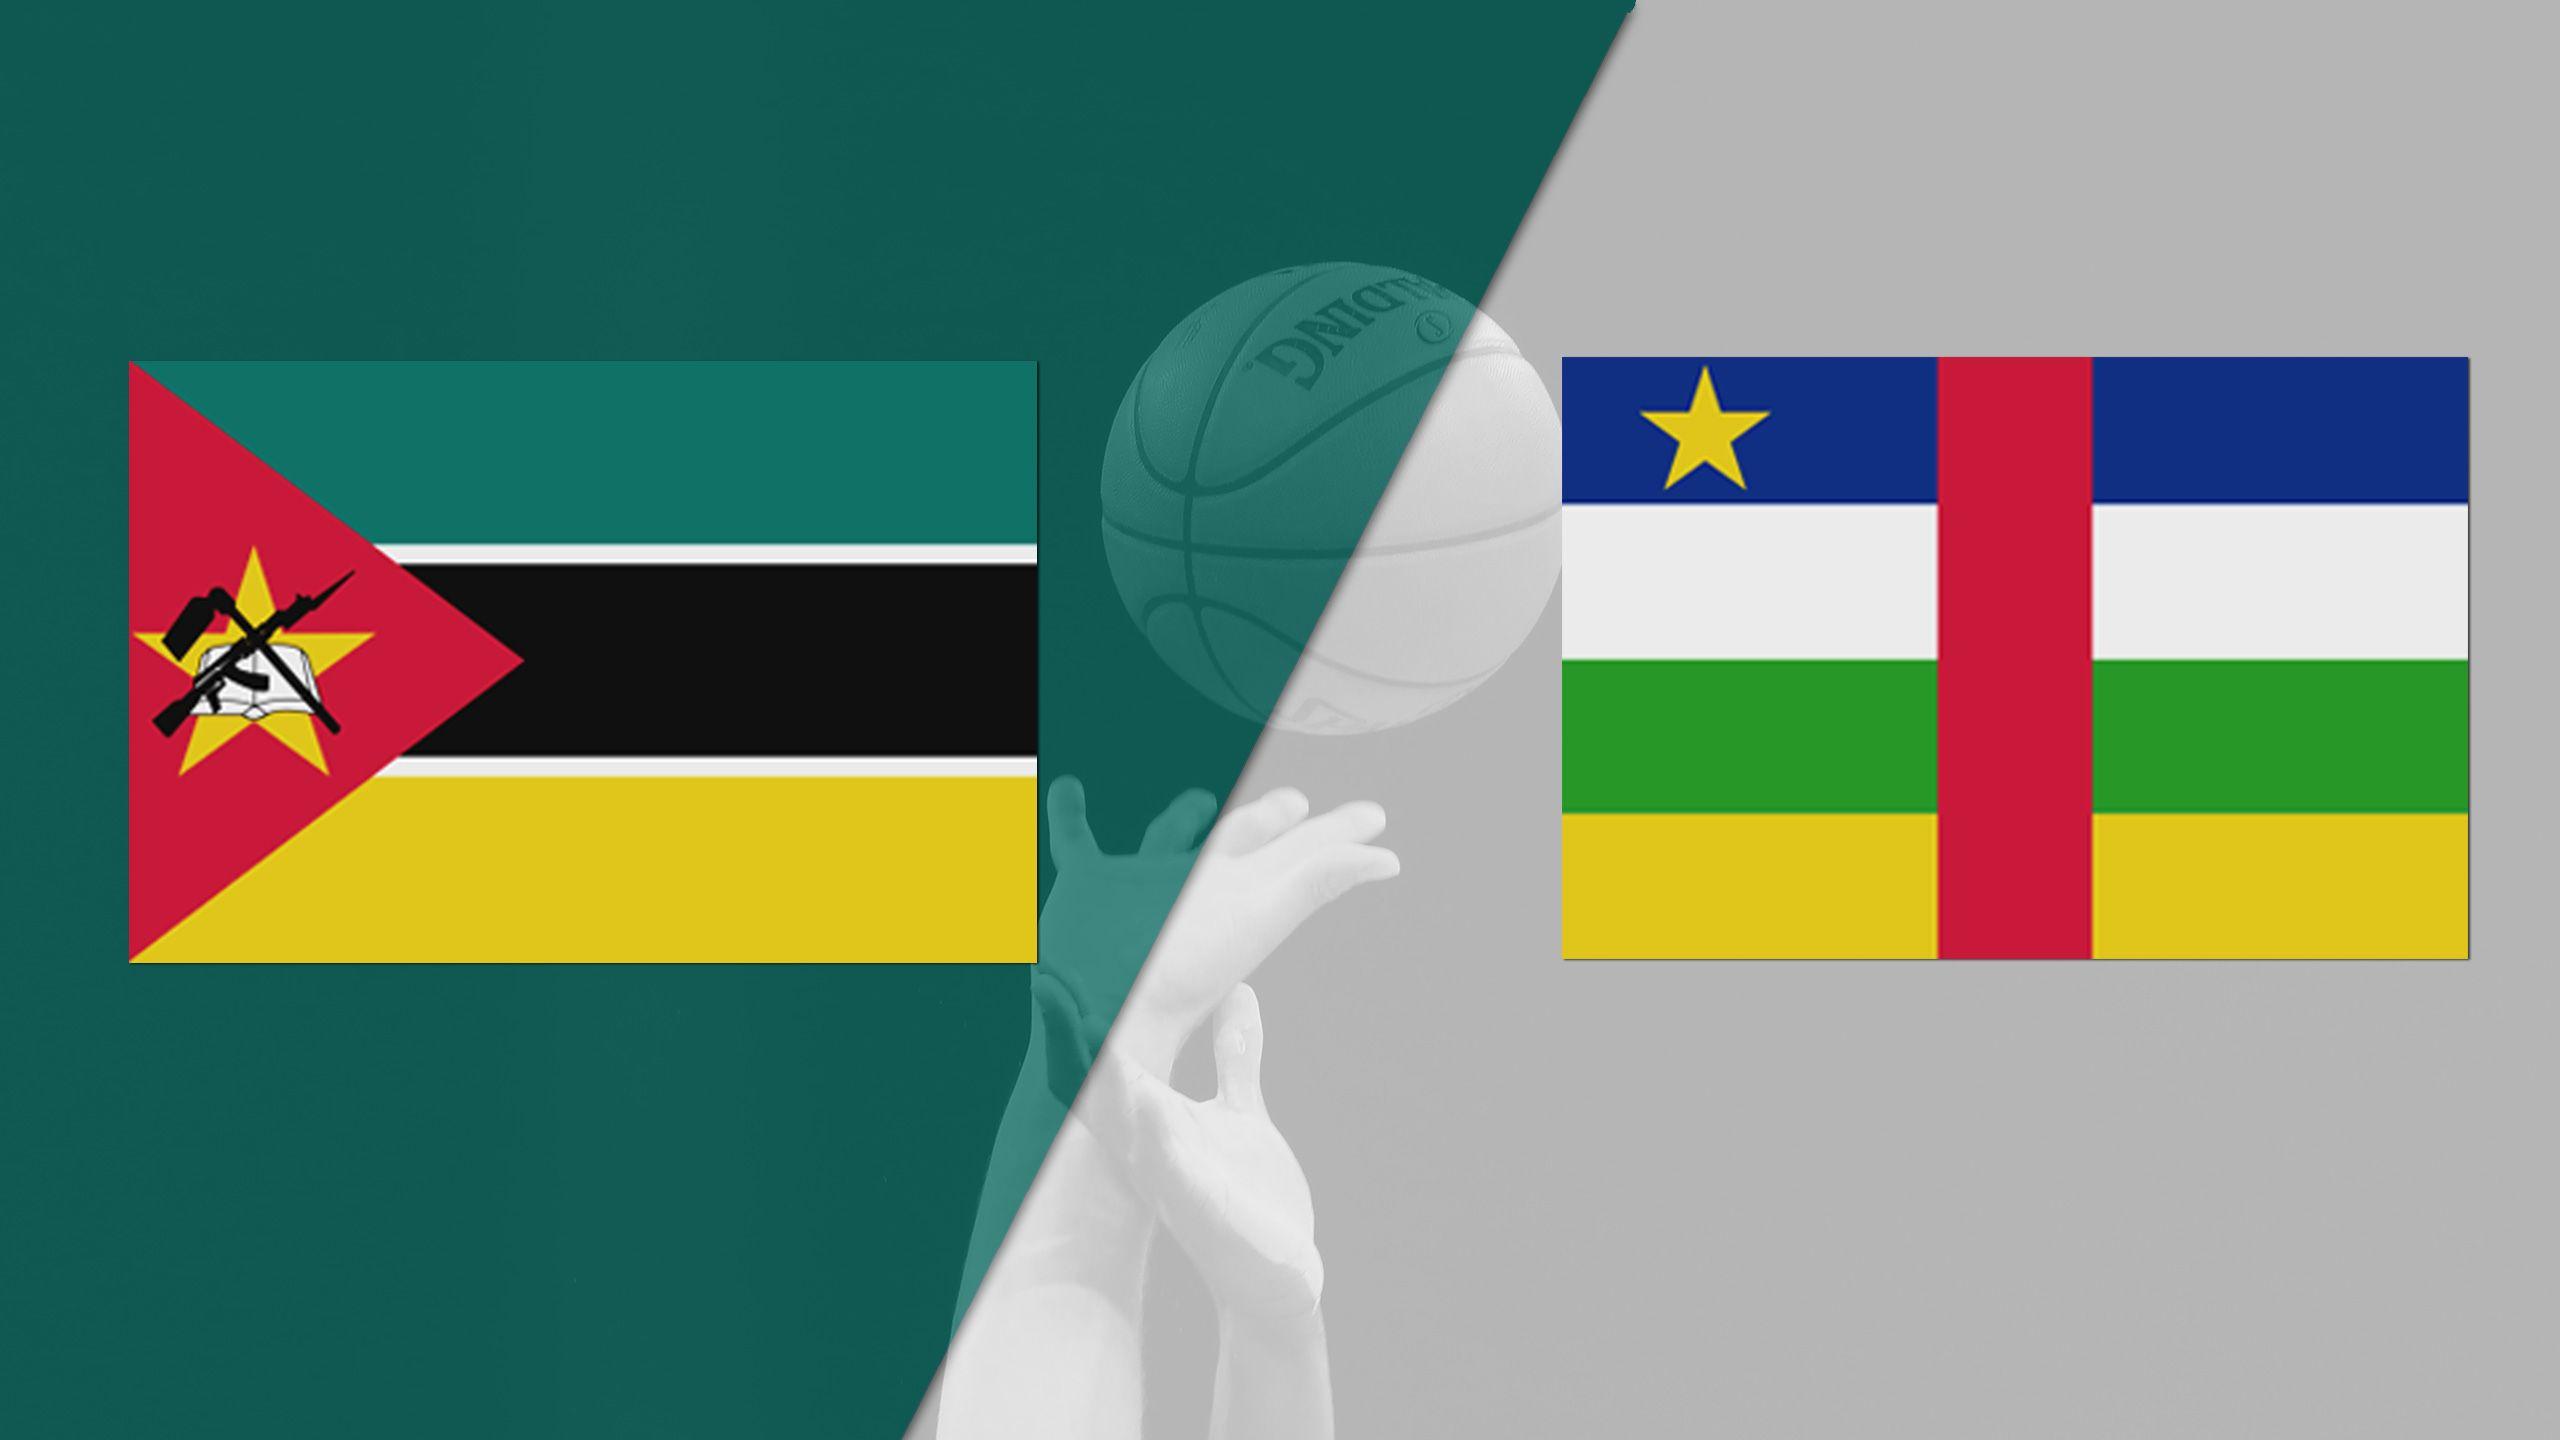 Mozambique vs. Central African Republic (FIBA World Cup 2019 Qualifier)